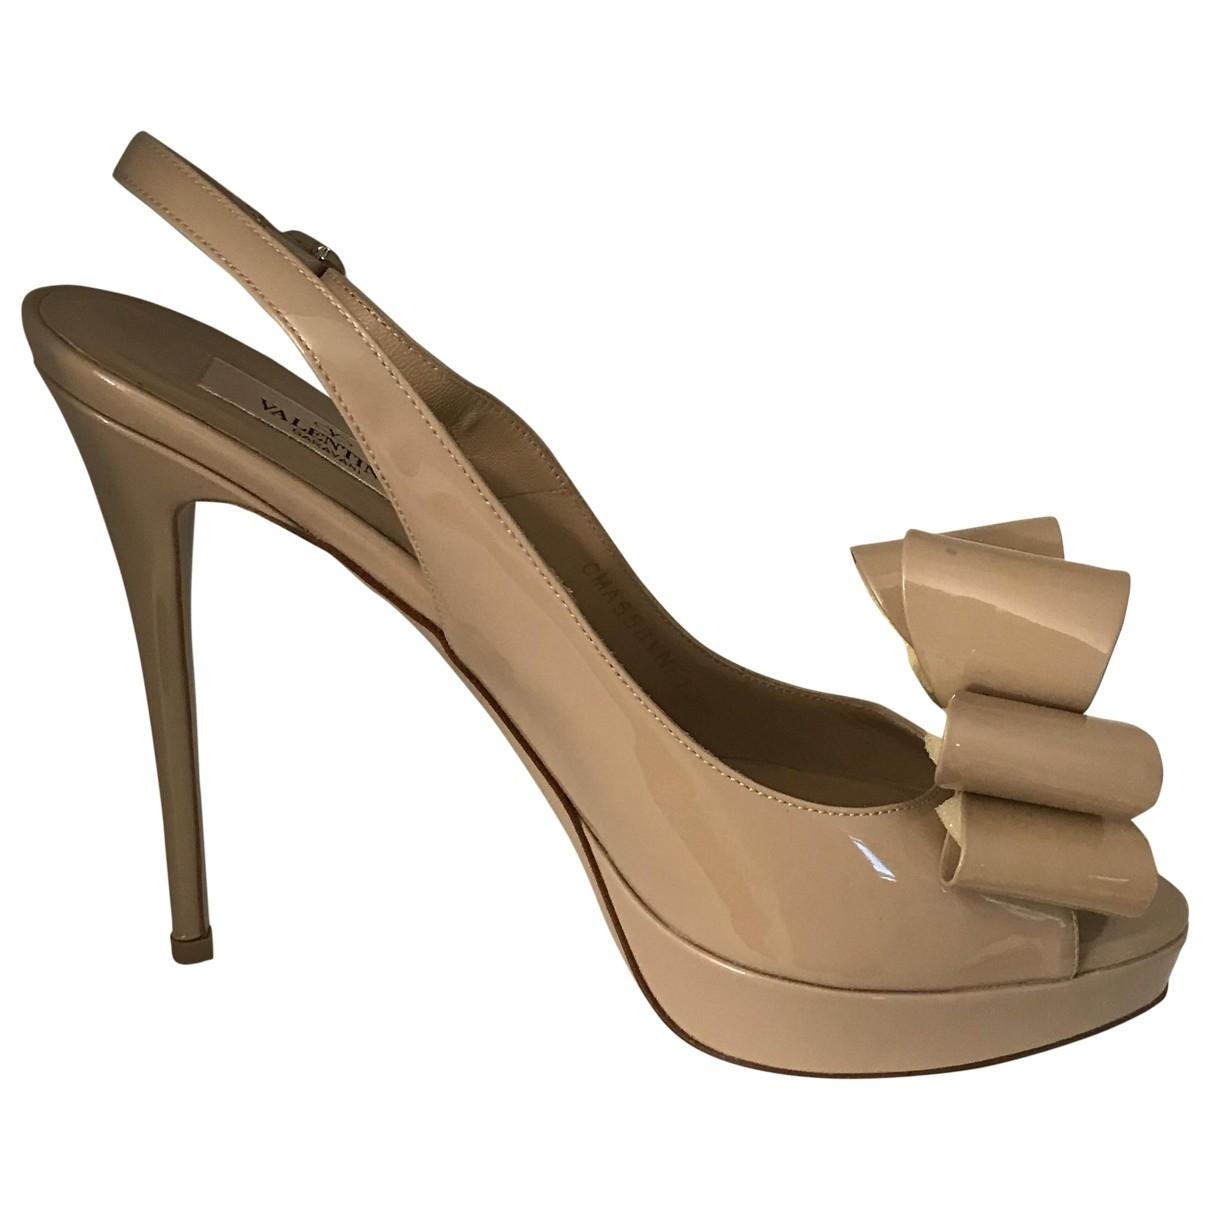 Valentino Garavani \N Beige Leather Sandals for Women 39 EU